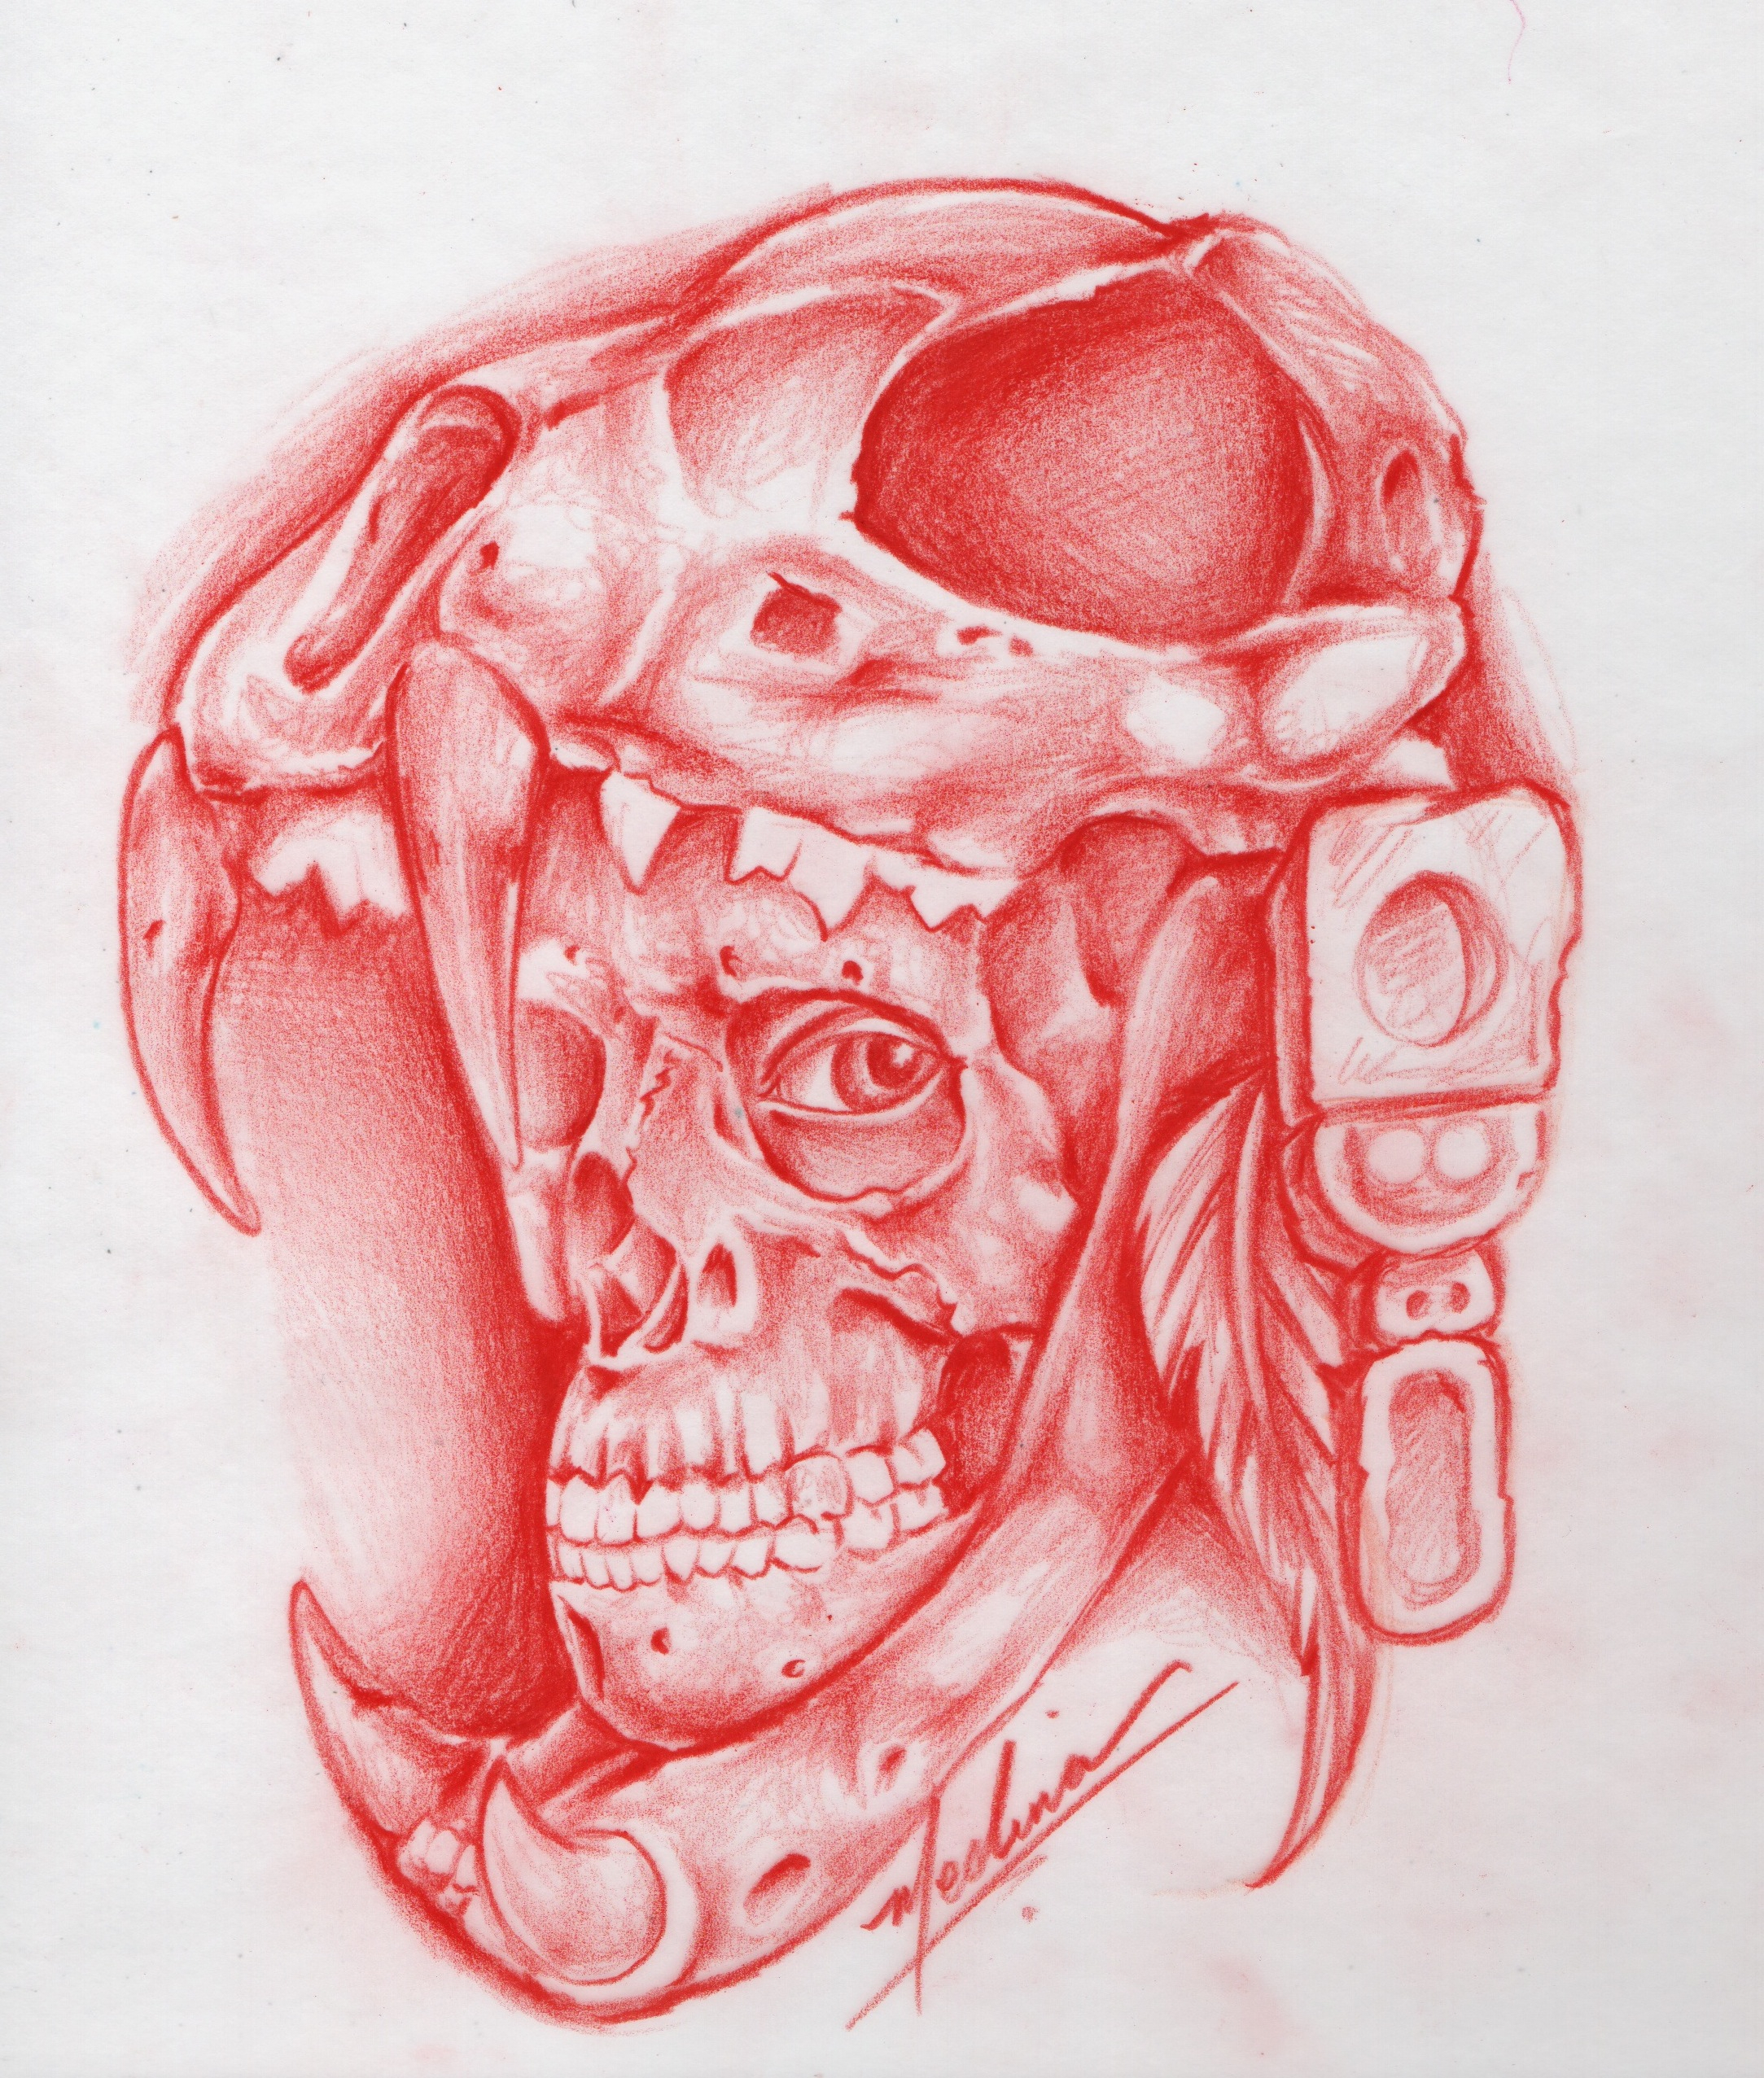 2167x2553 Drawing Of Aztec Warrior Aztec Warrior Skull Drawing Michael